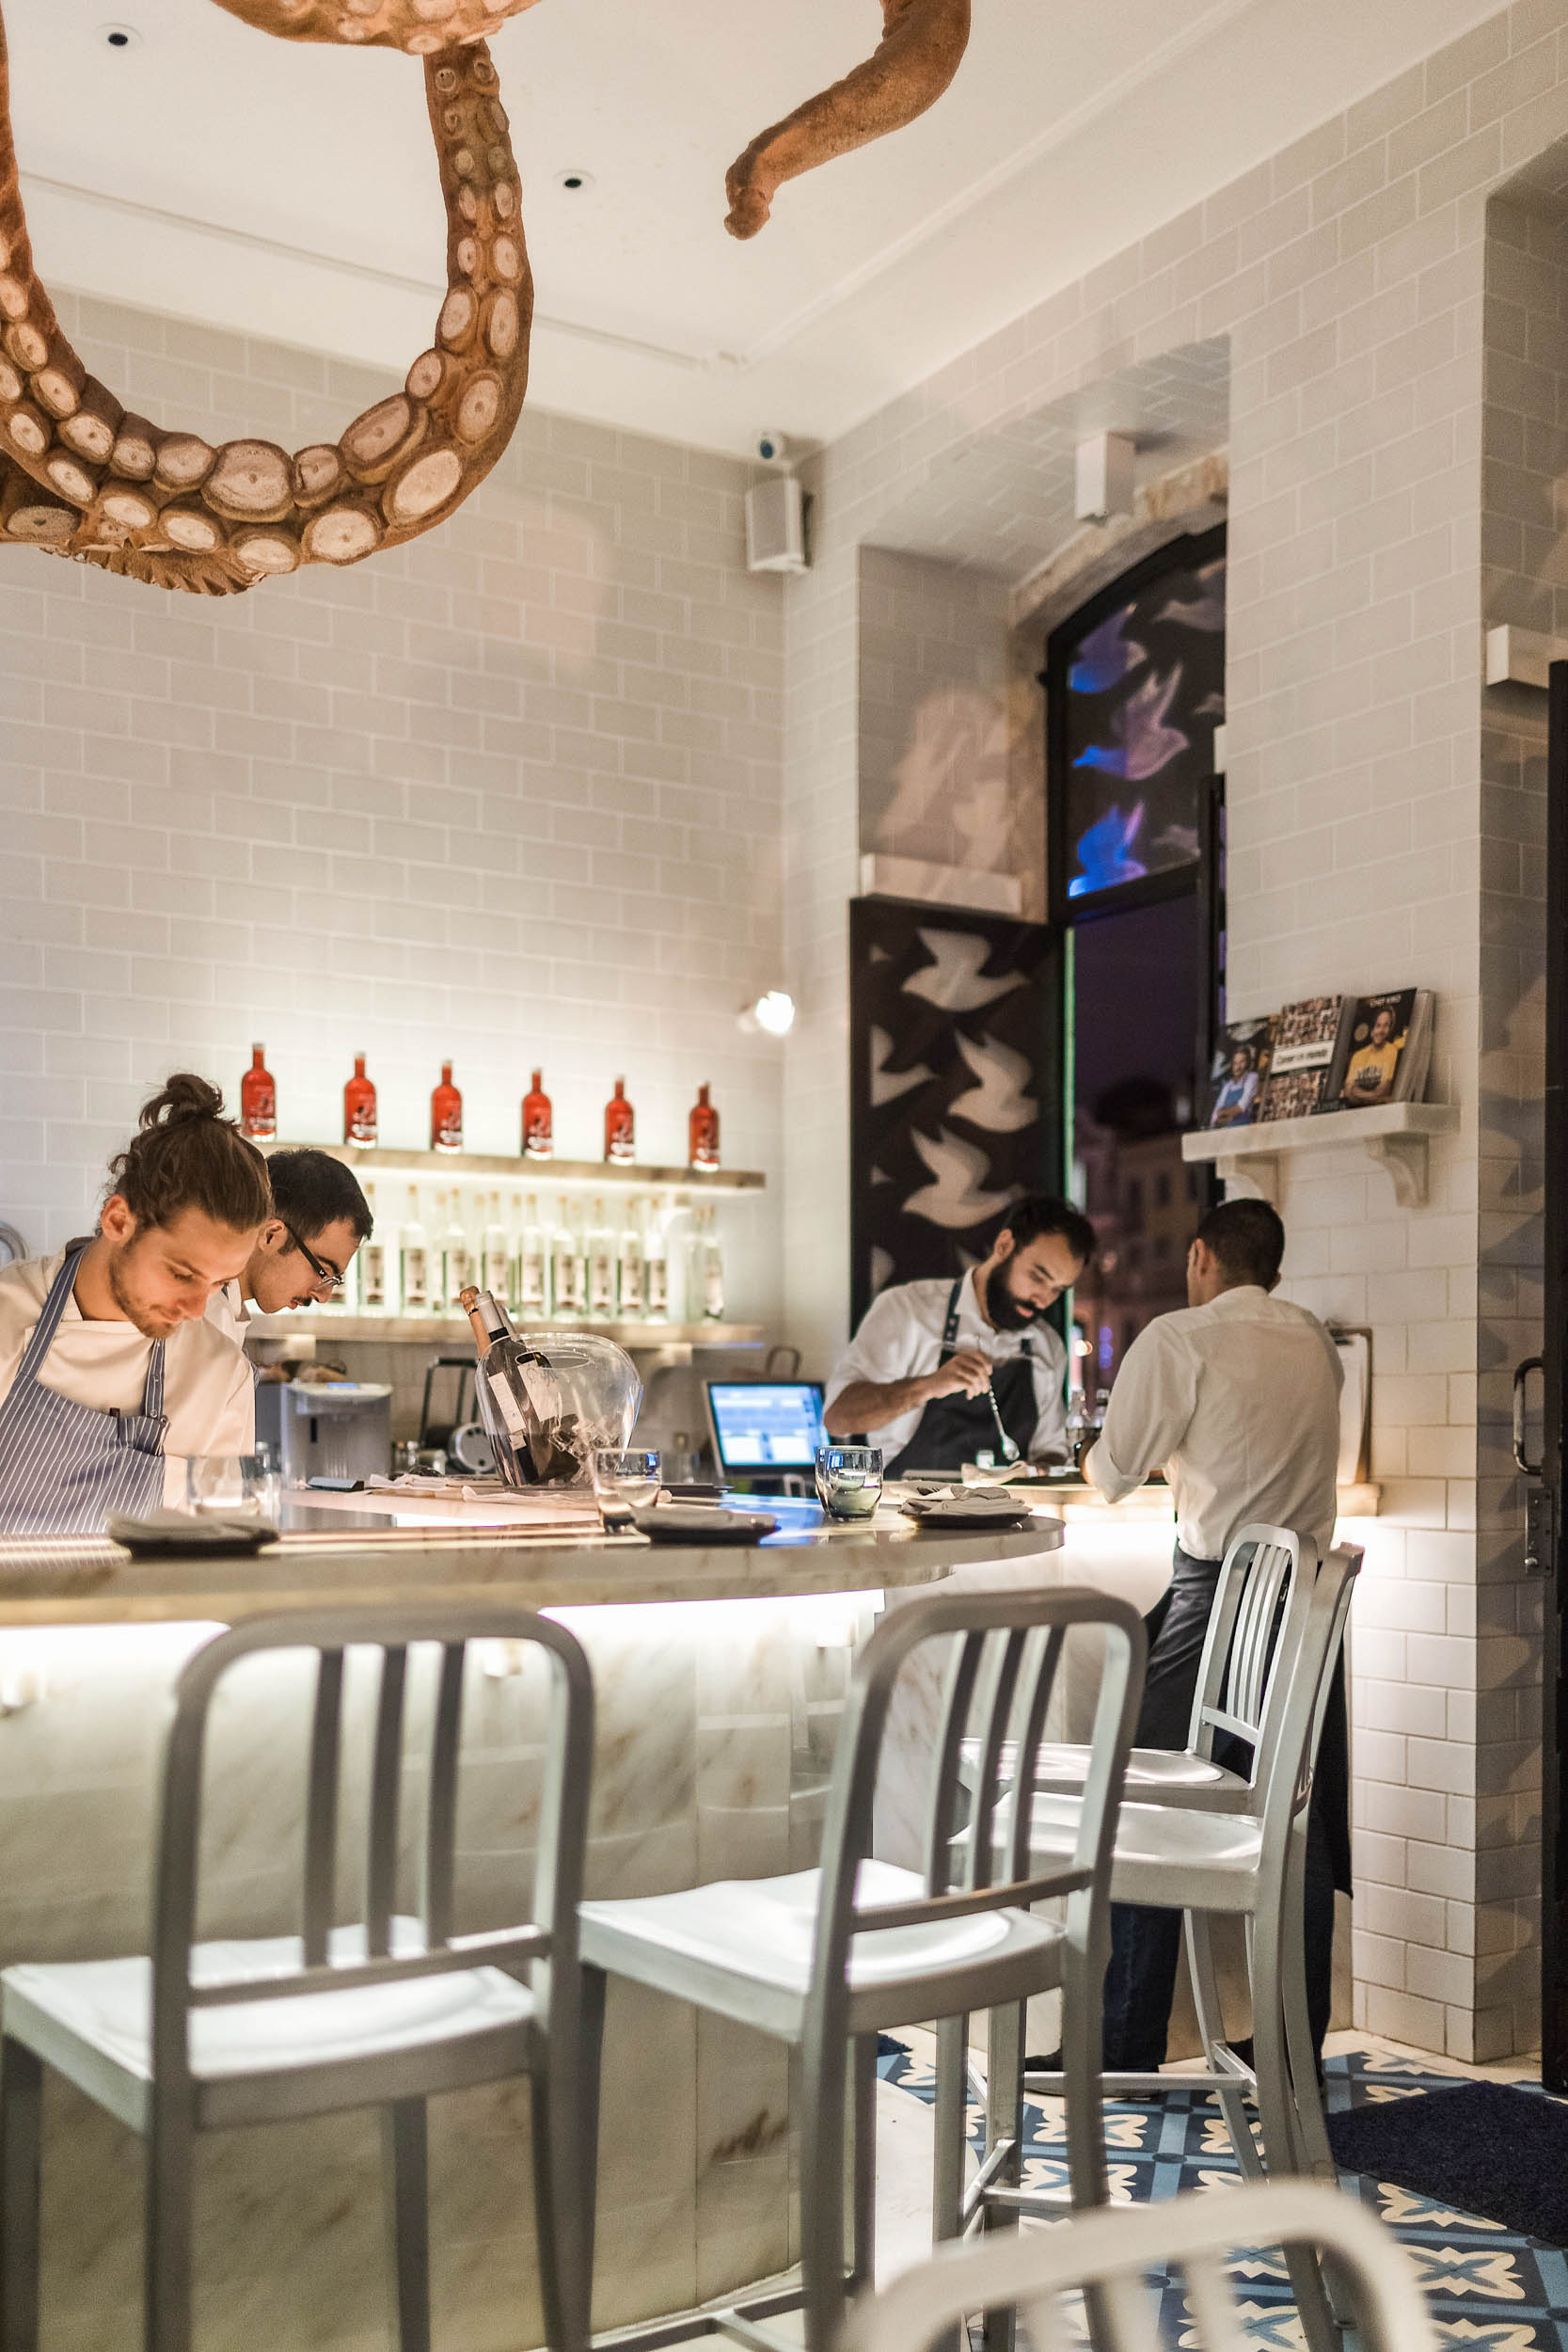 A Cevicheria is a Peruvian restaurant in Lisbonby famous local chef, Chef Kiko